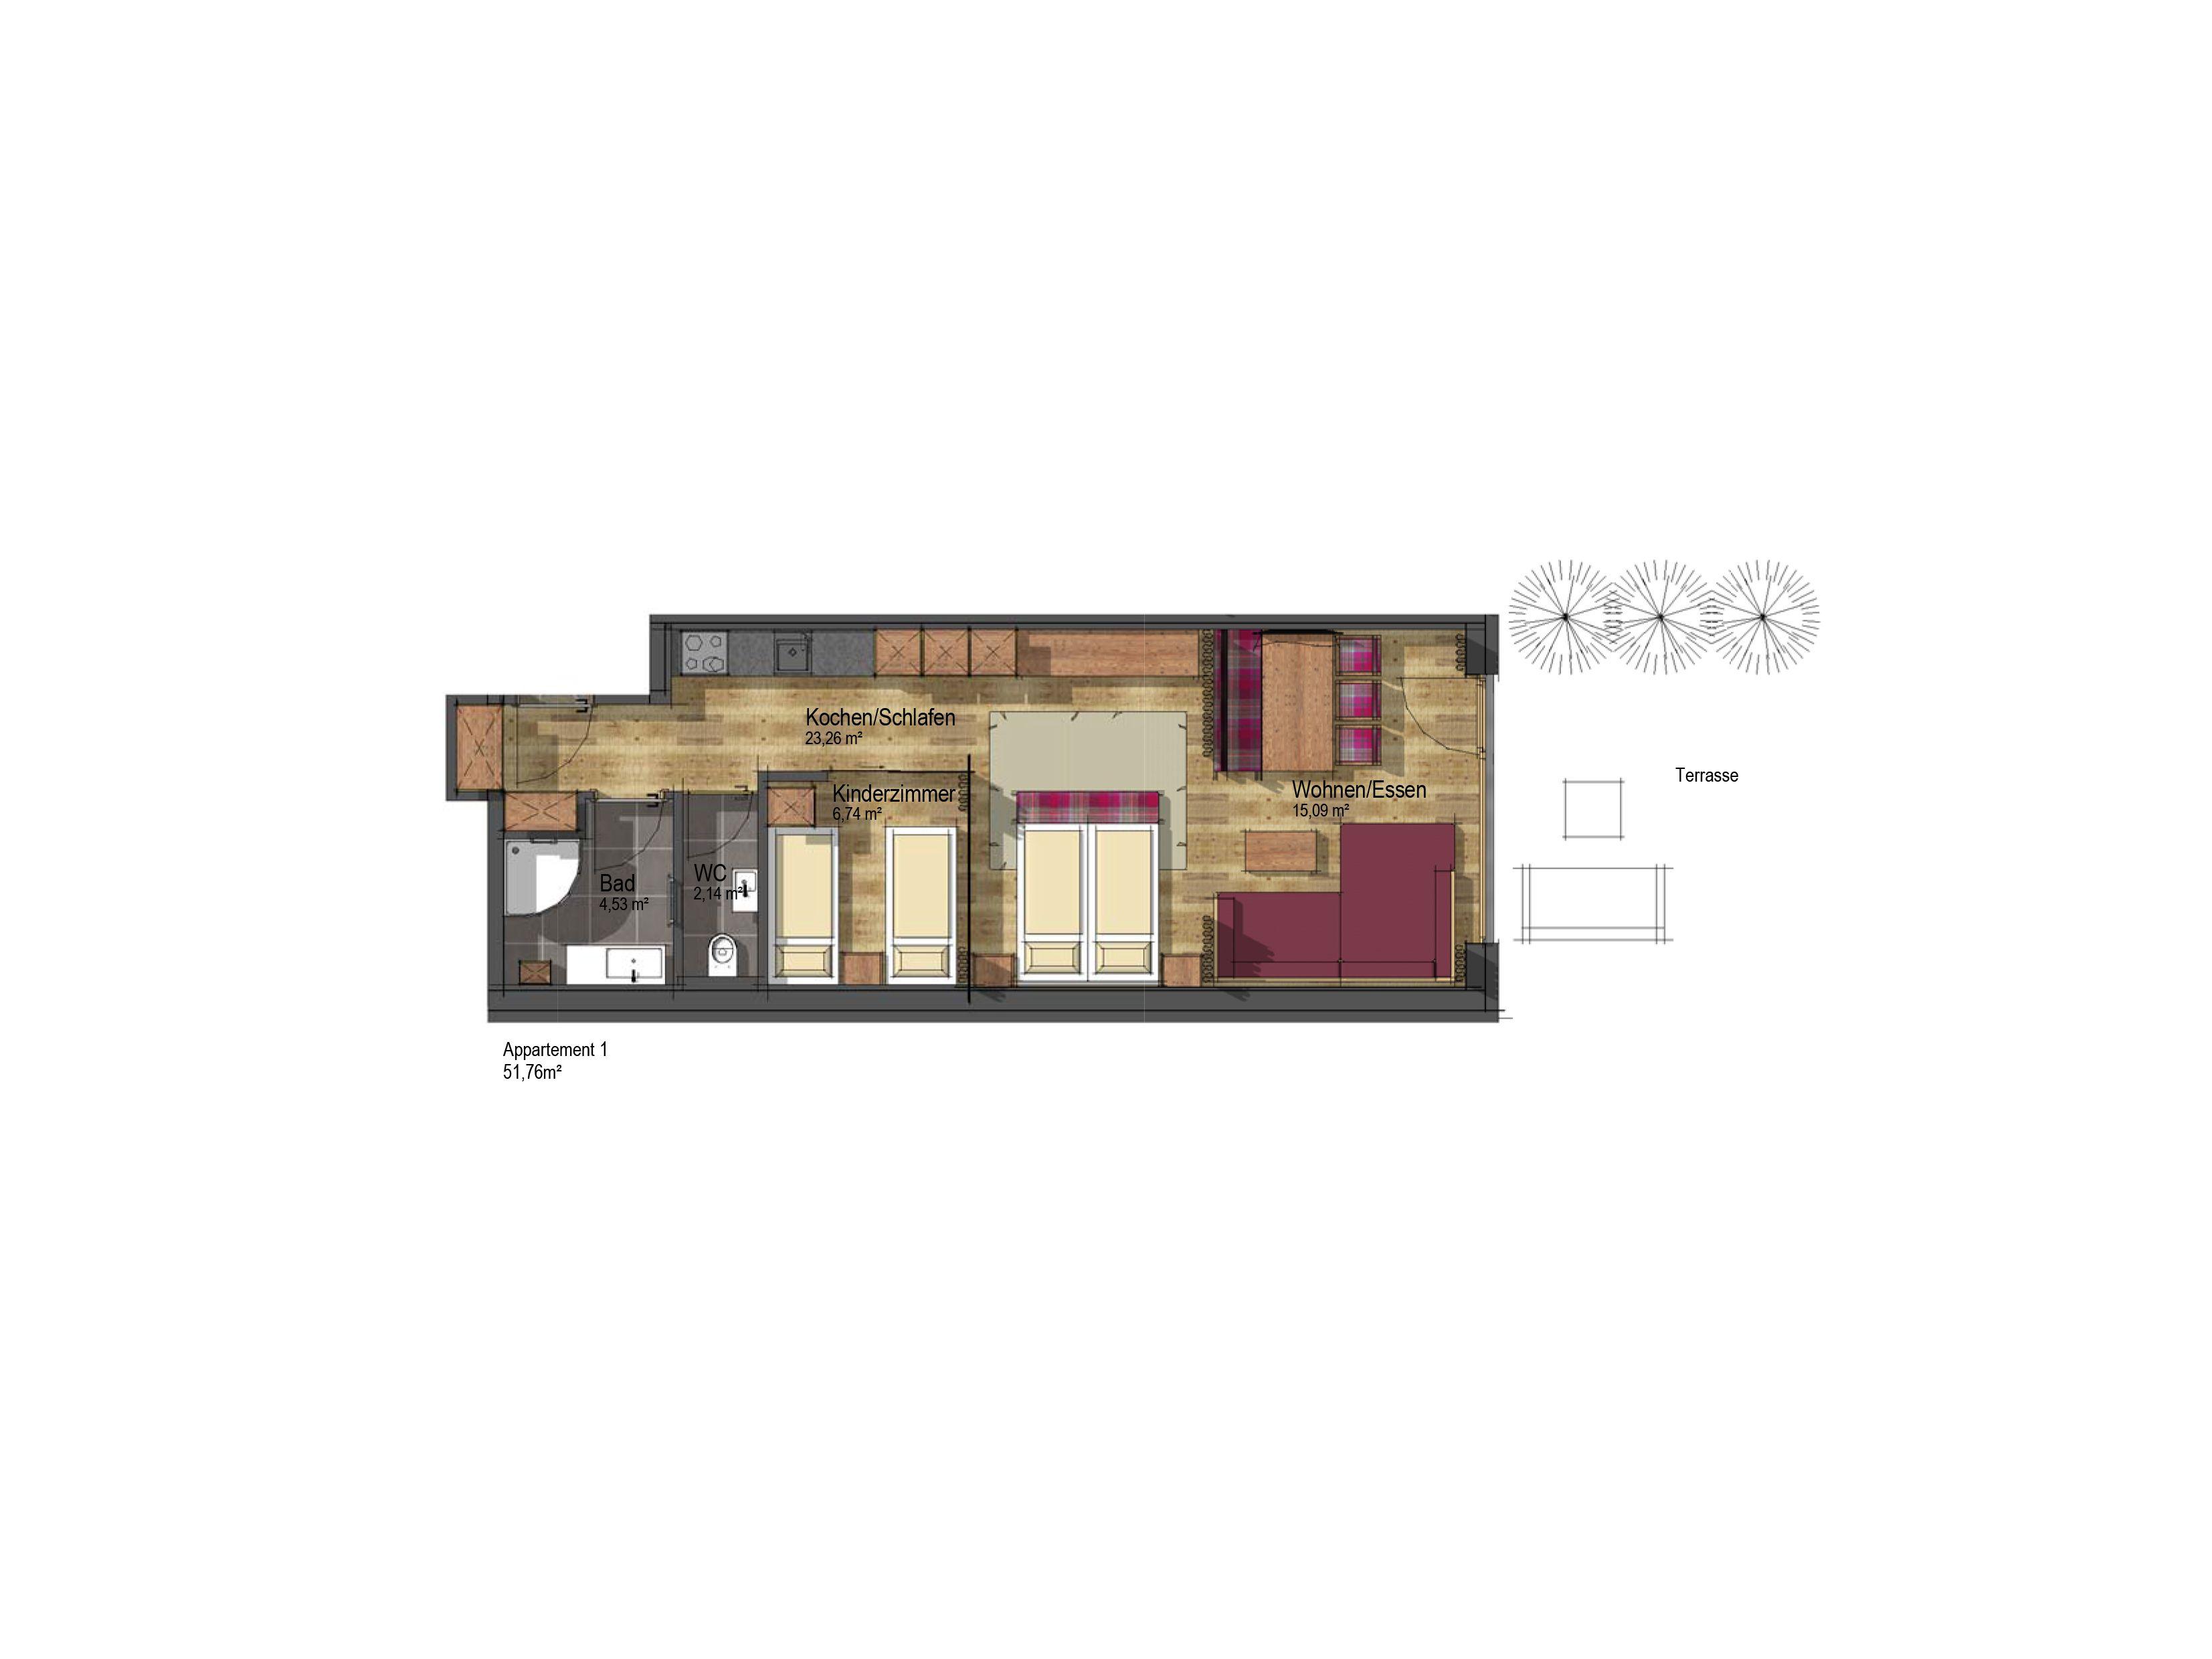 Chalet-appartement The Peak Dolomiten - 2-4 personen